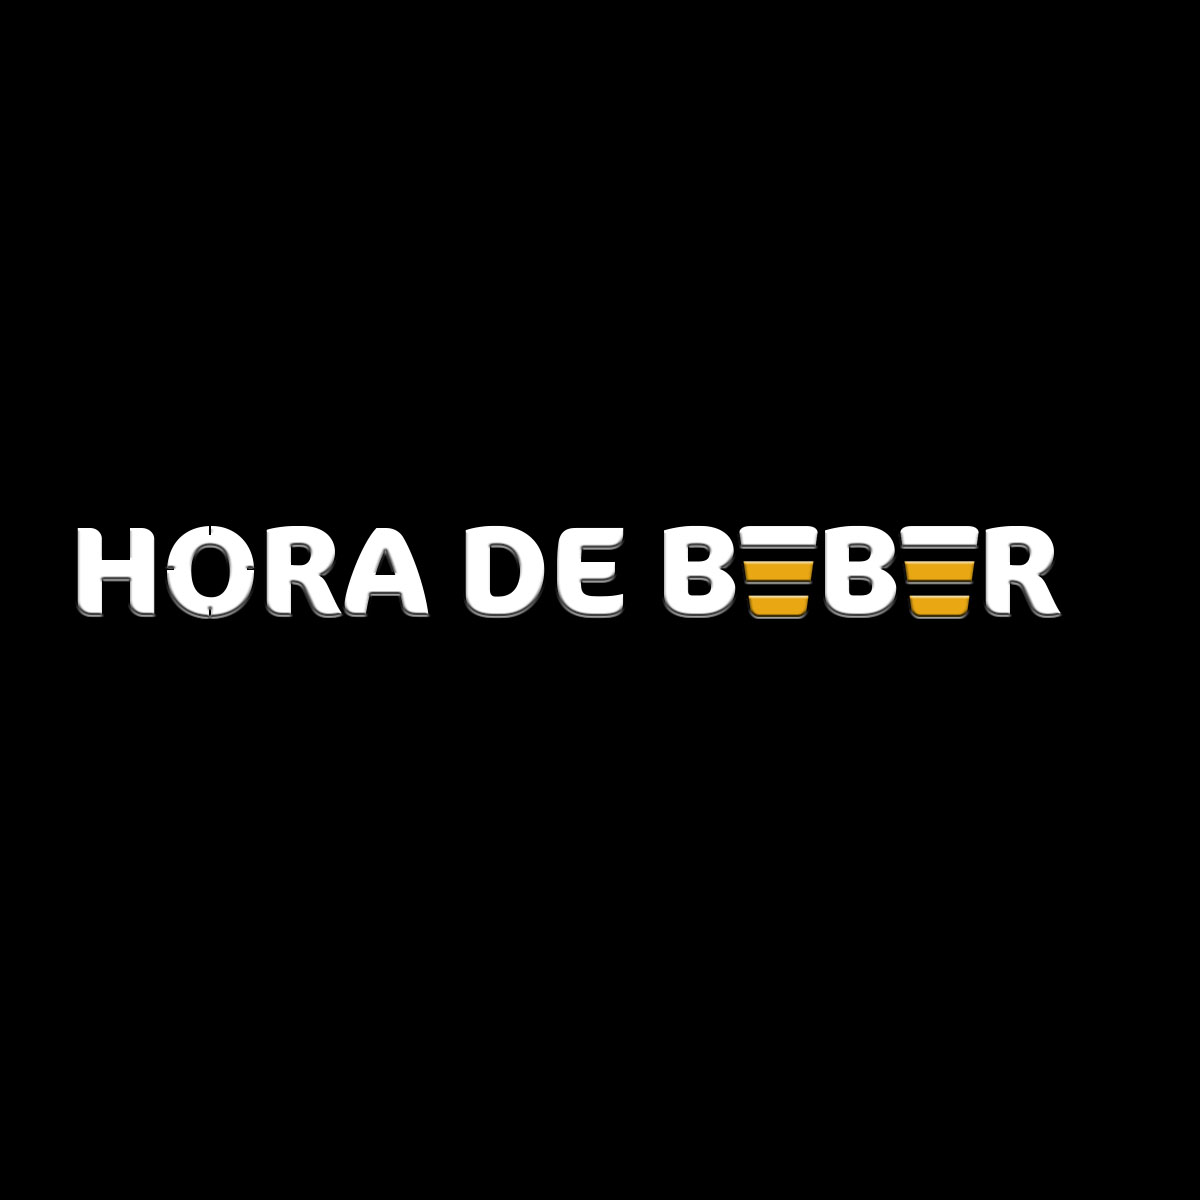 Logo Design for Hora de Beber by Adeel Hanif® | Design #3891755